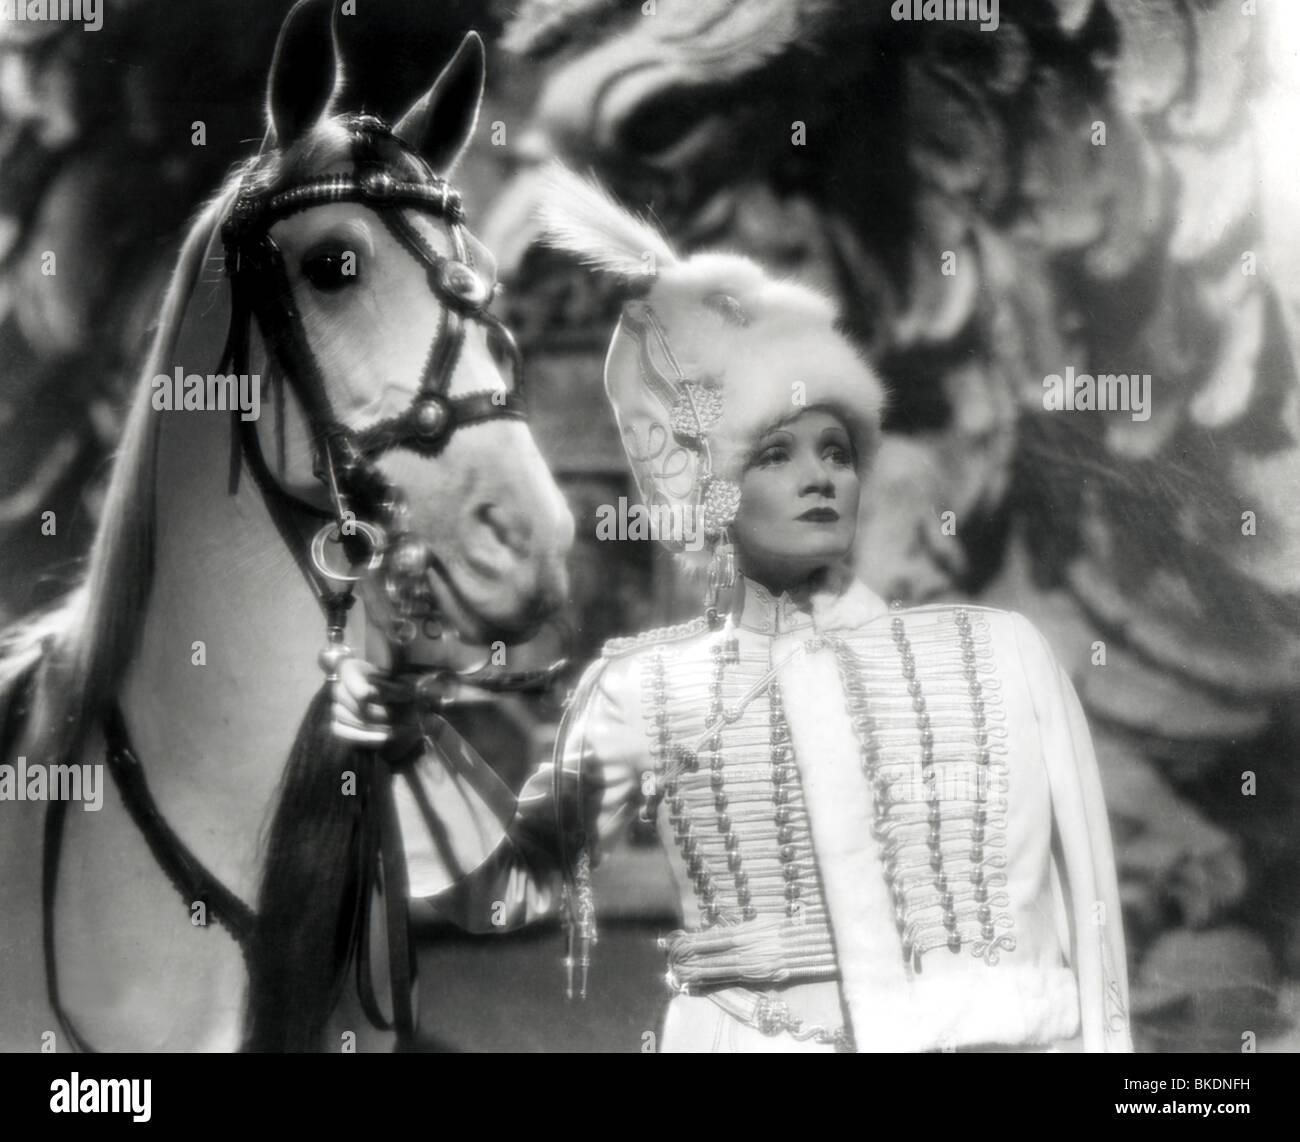 THE SCARLET EMPRESS (1934) MARLENE DIETRICH SCEP 001P - Stock Image